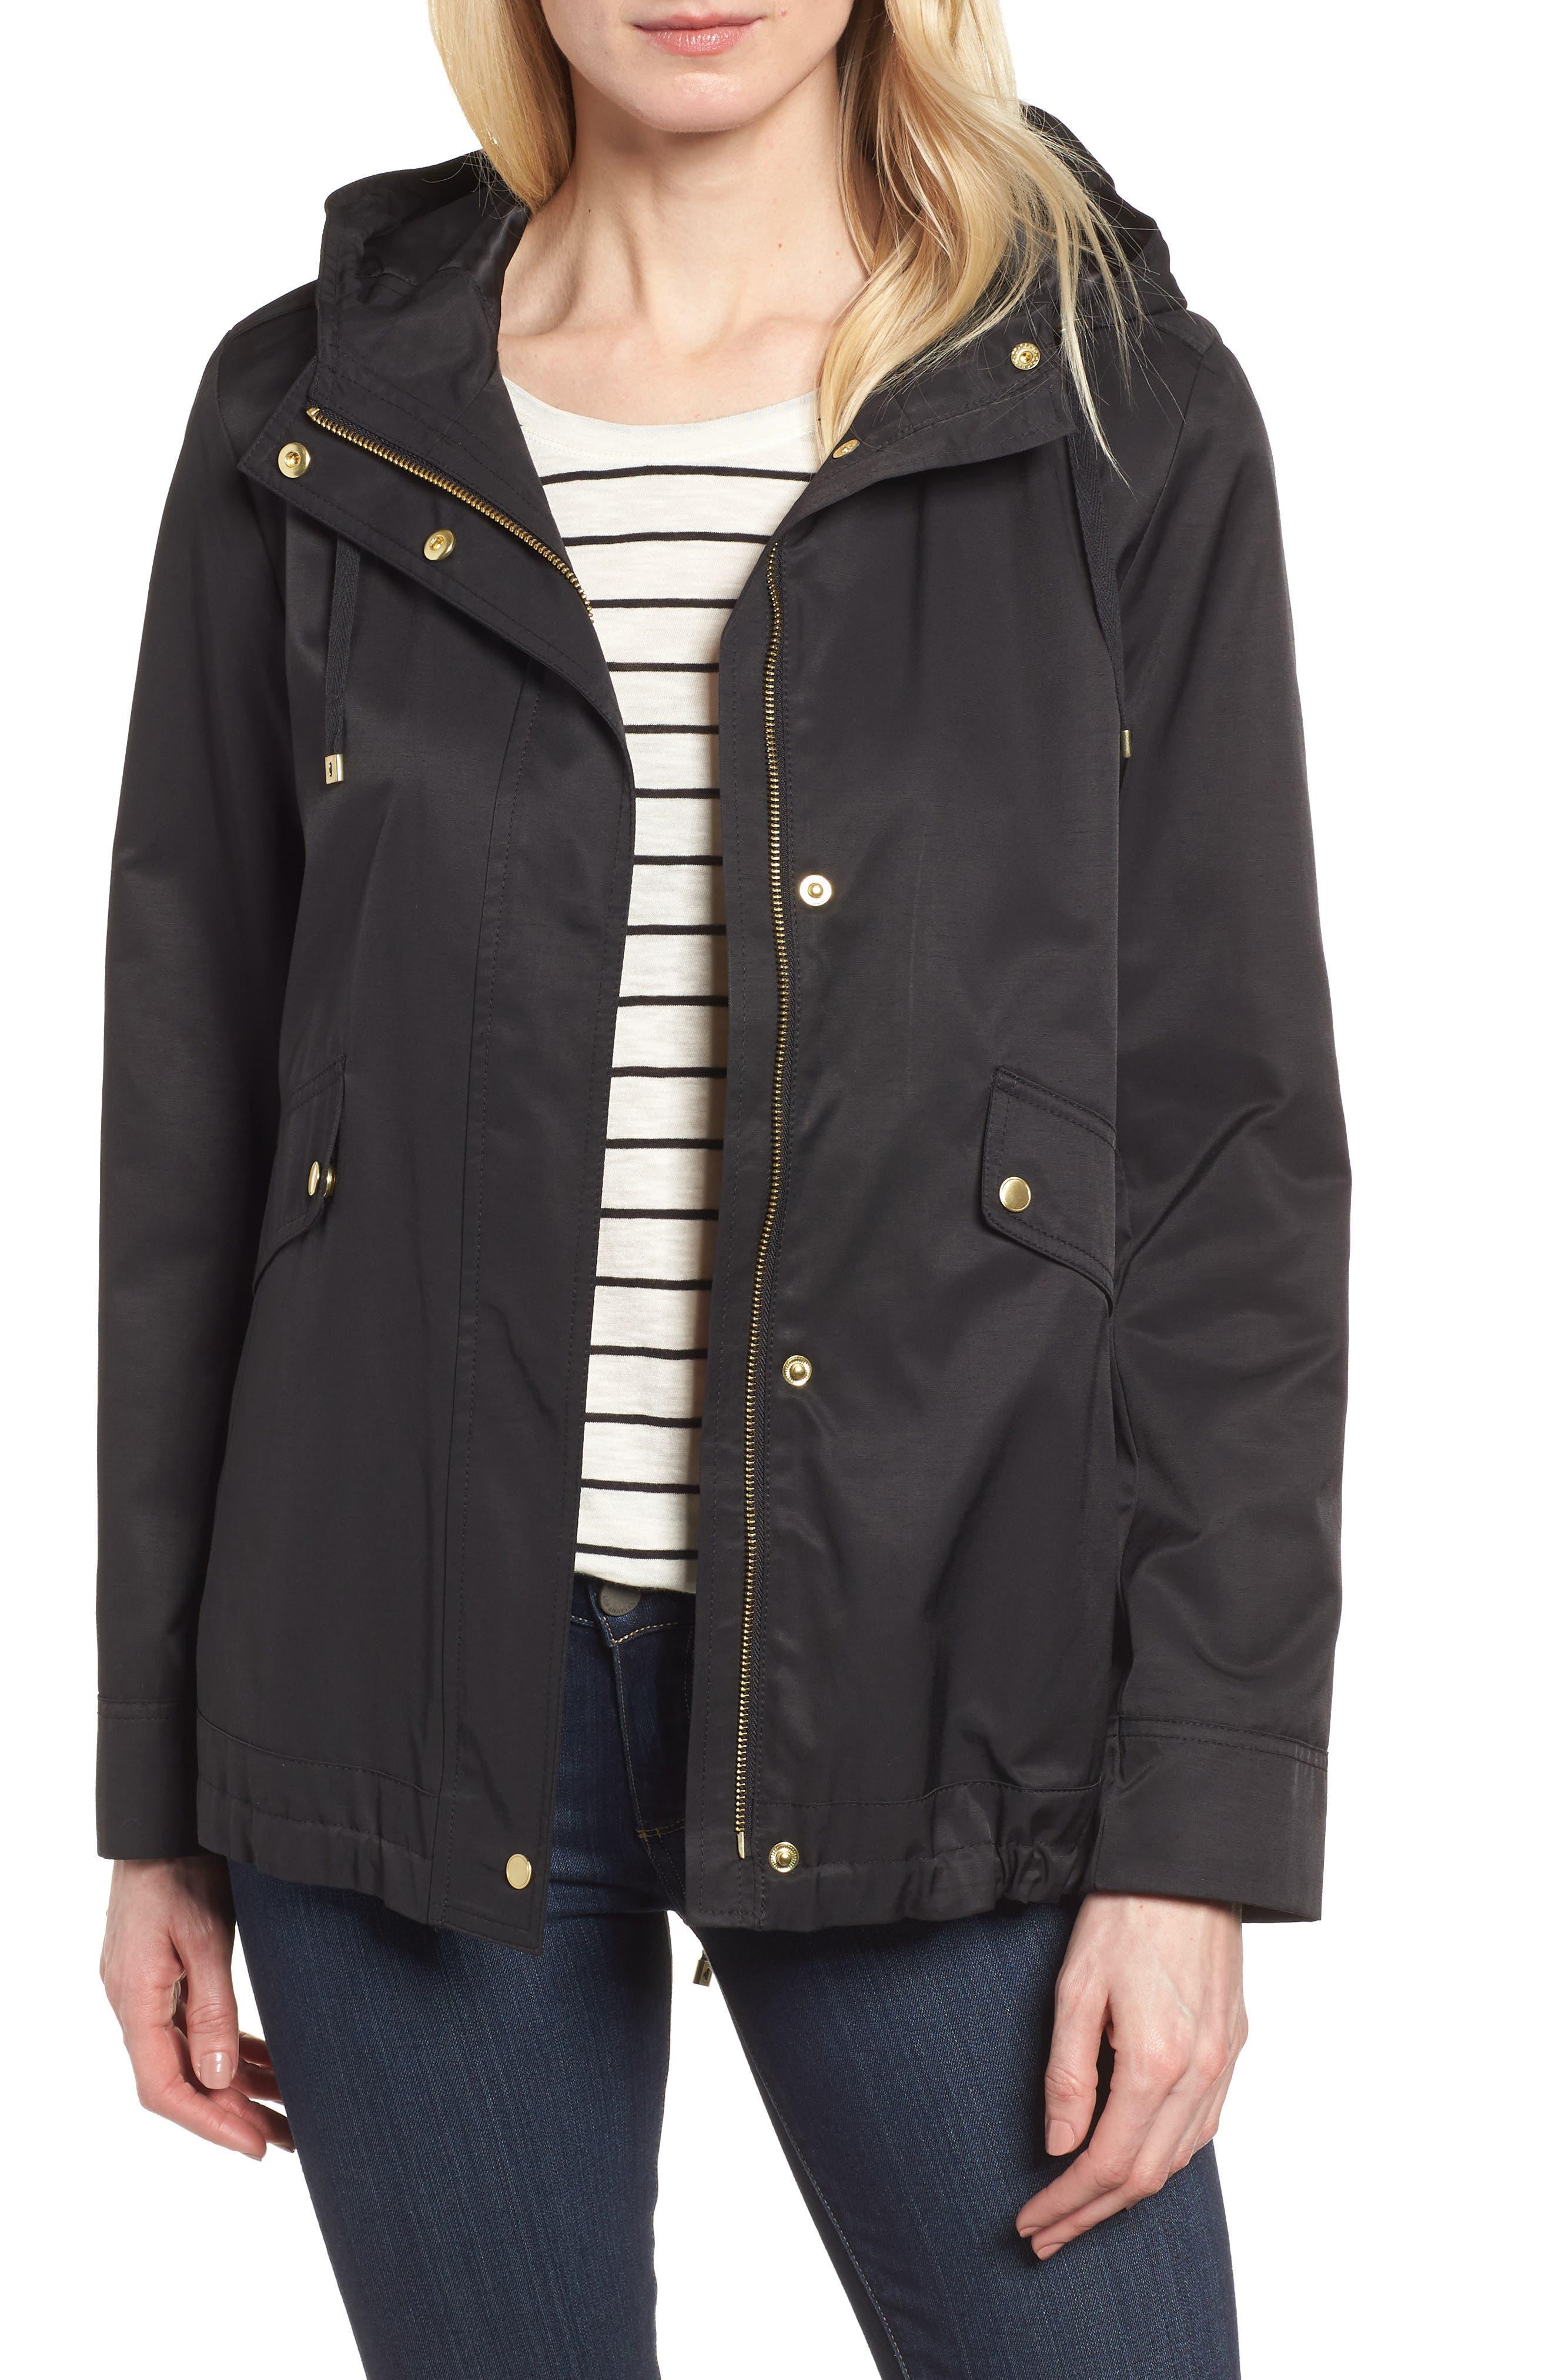 A-Line Jacket with Hood,                             Main thumbnail 1, color,                             Black